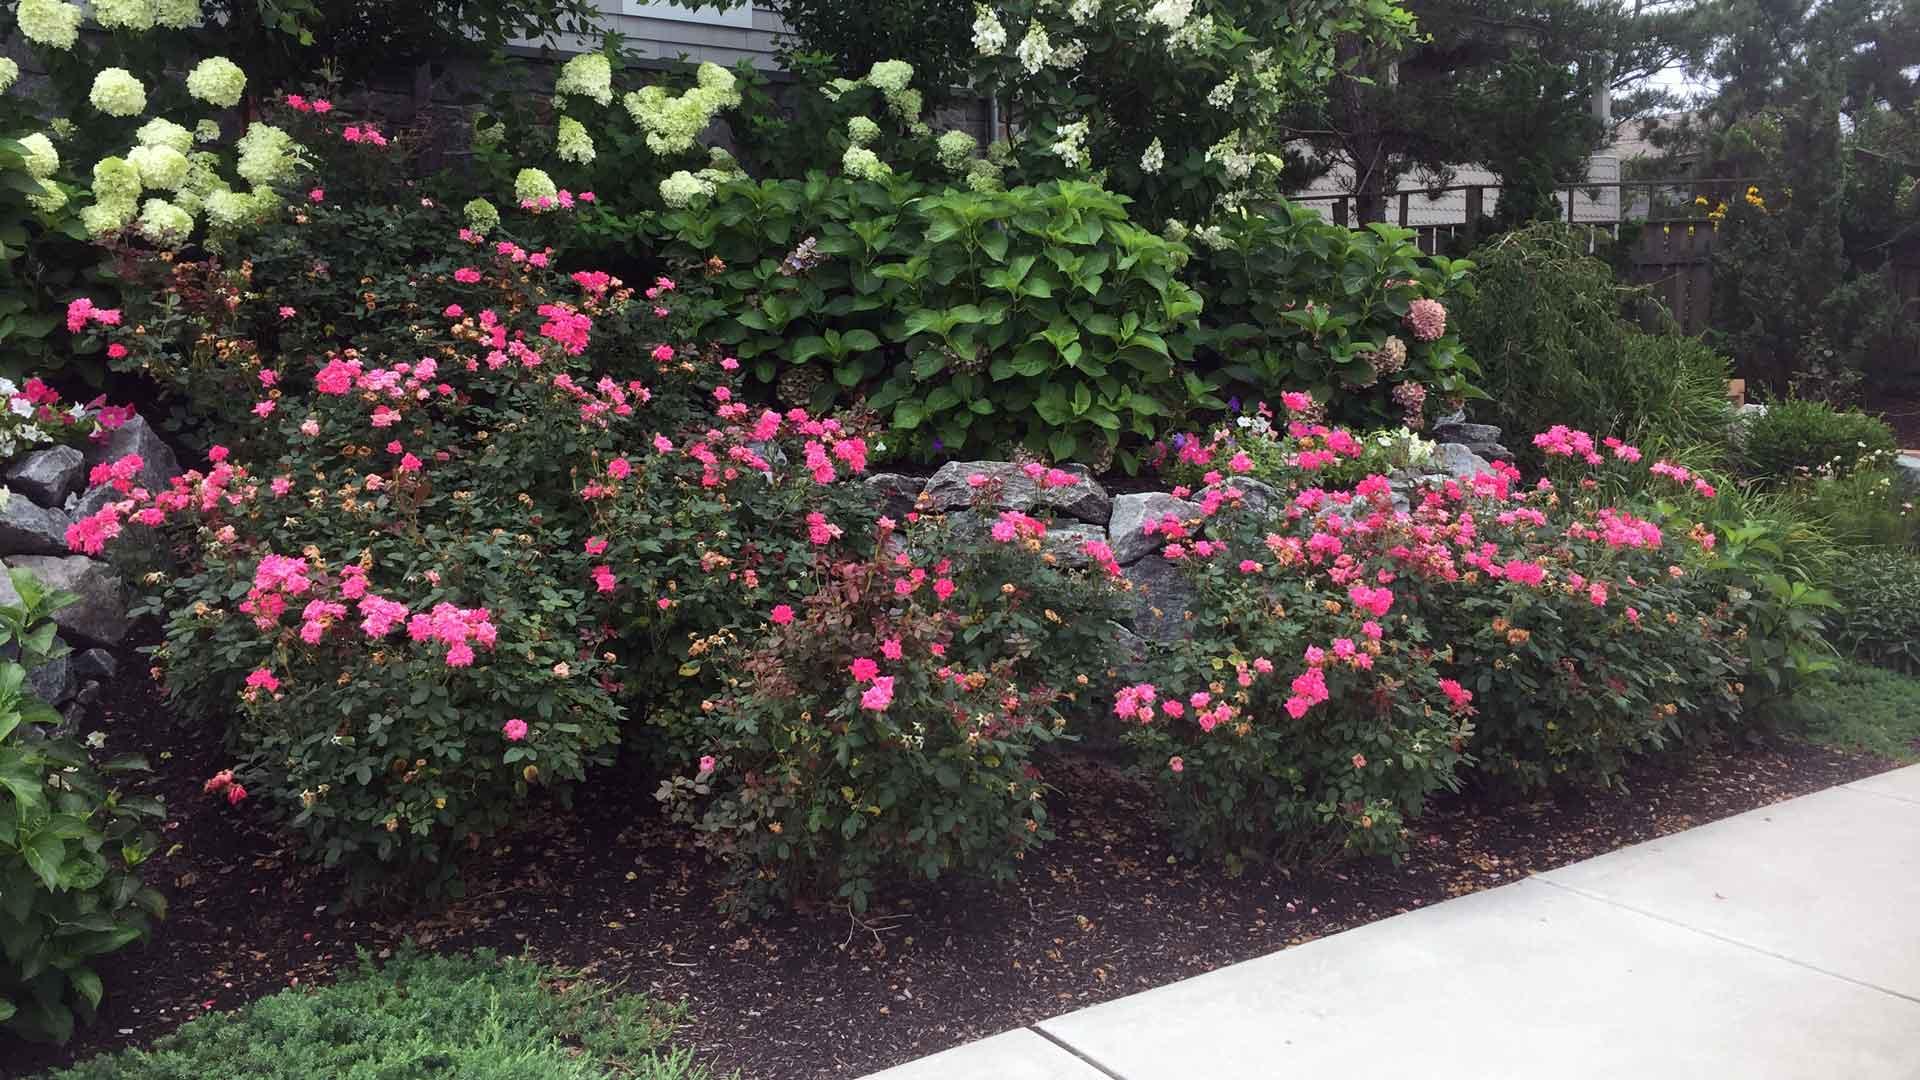 Auburn-Sky-Landscaping-Softscape-Plants-Curb-Appeal.jpg